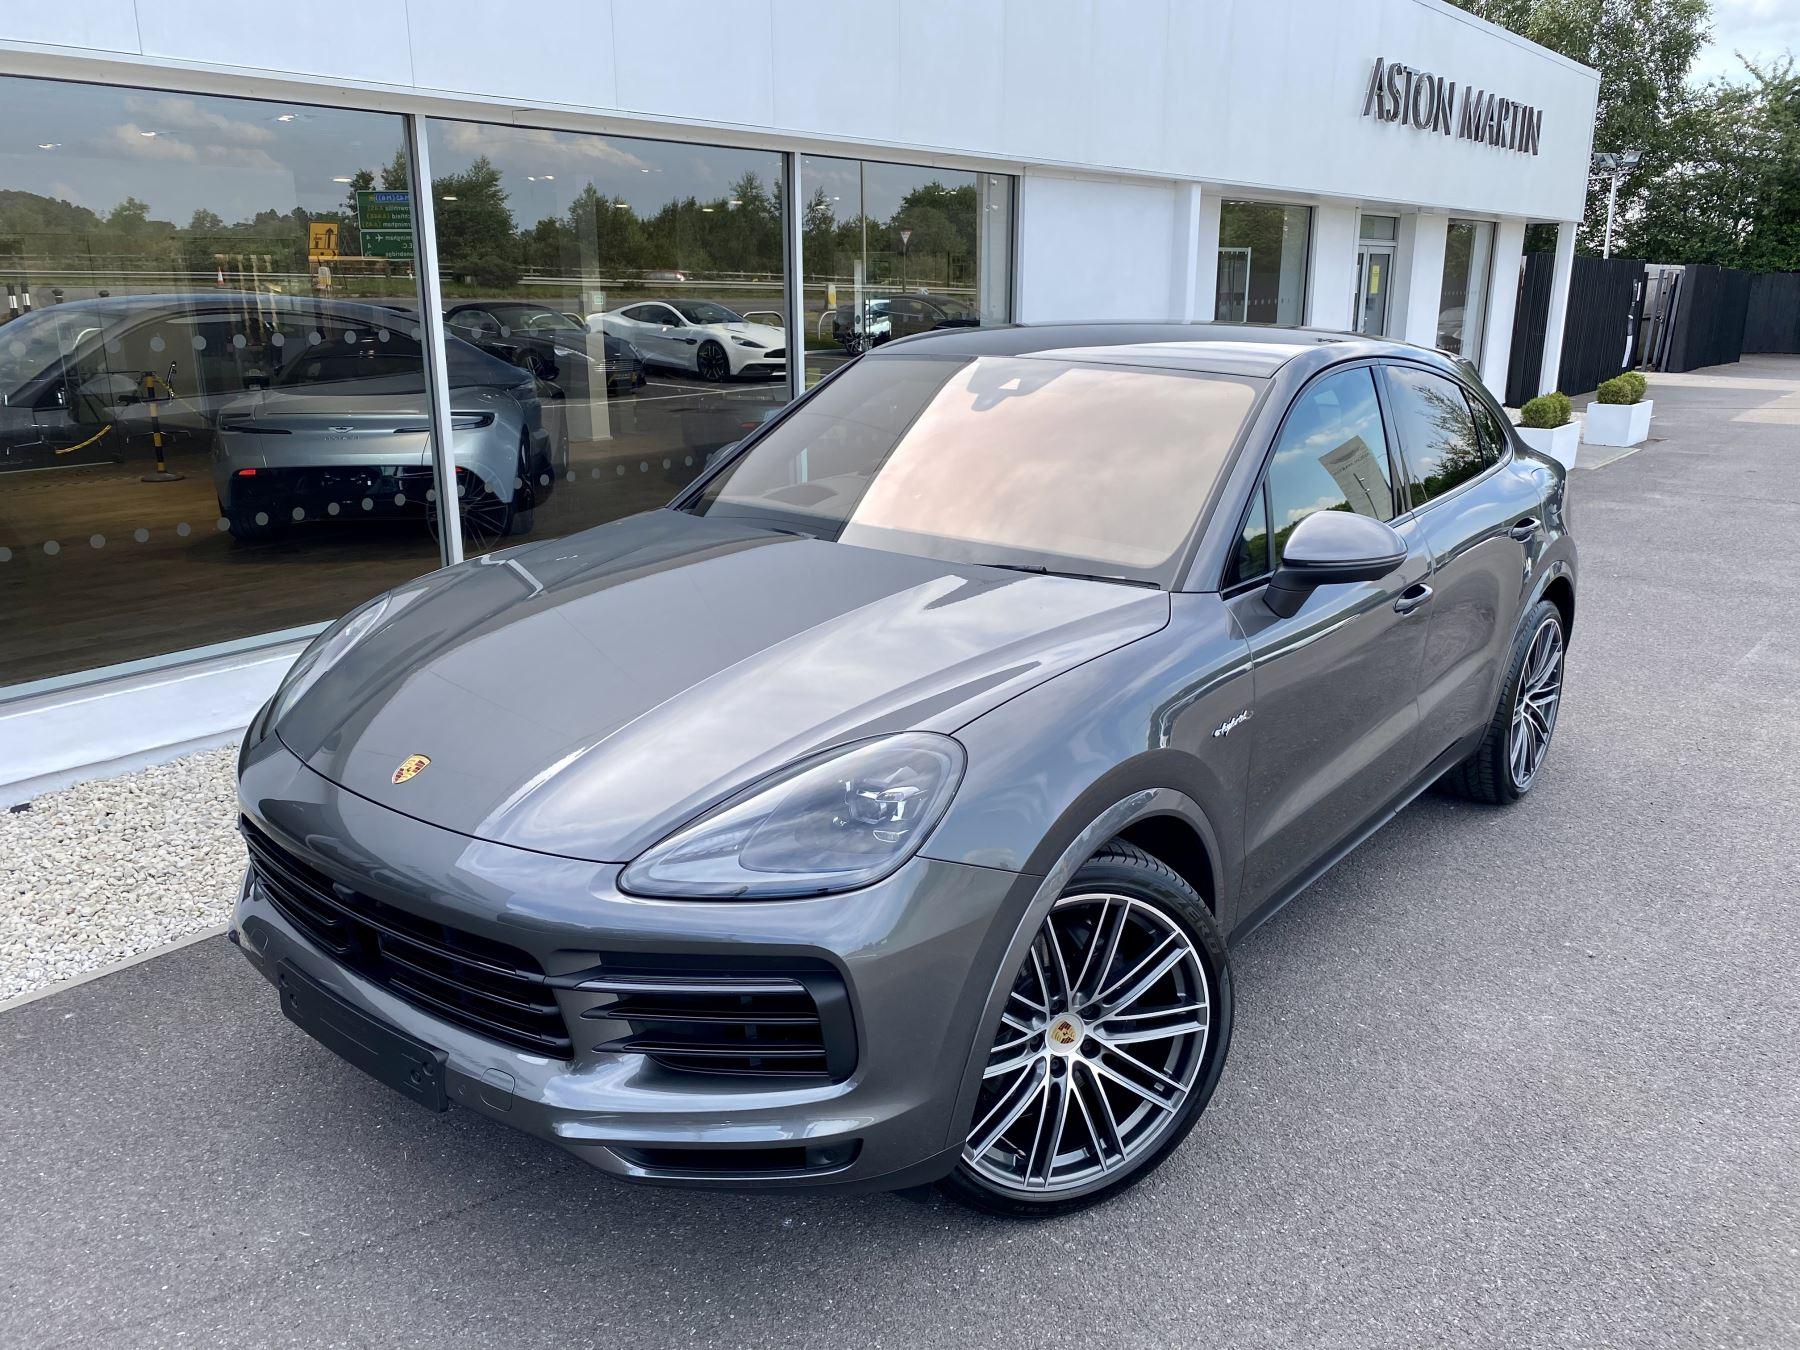 Porsche Cayenne Coupe 3.0 V6 E-Hybrid 5dr Tiptronic S Quartzite Grey and Cohiba brown two tone leather. 2995.0 Petrol/Electric Automatic Estate (2020)